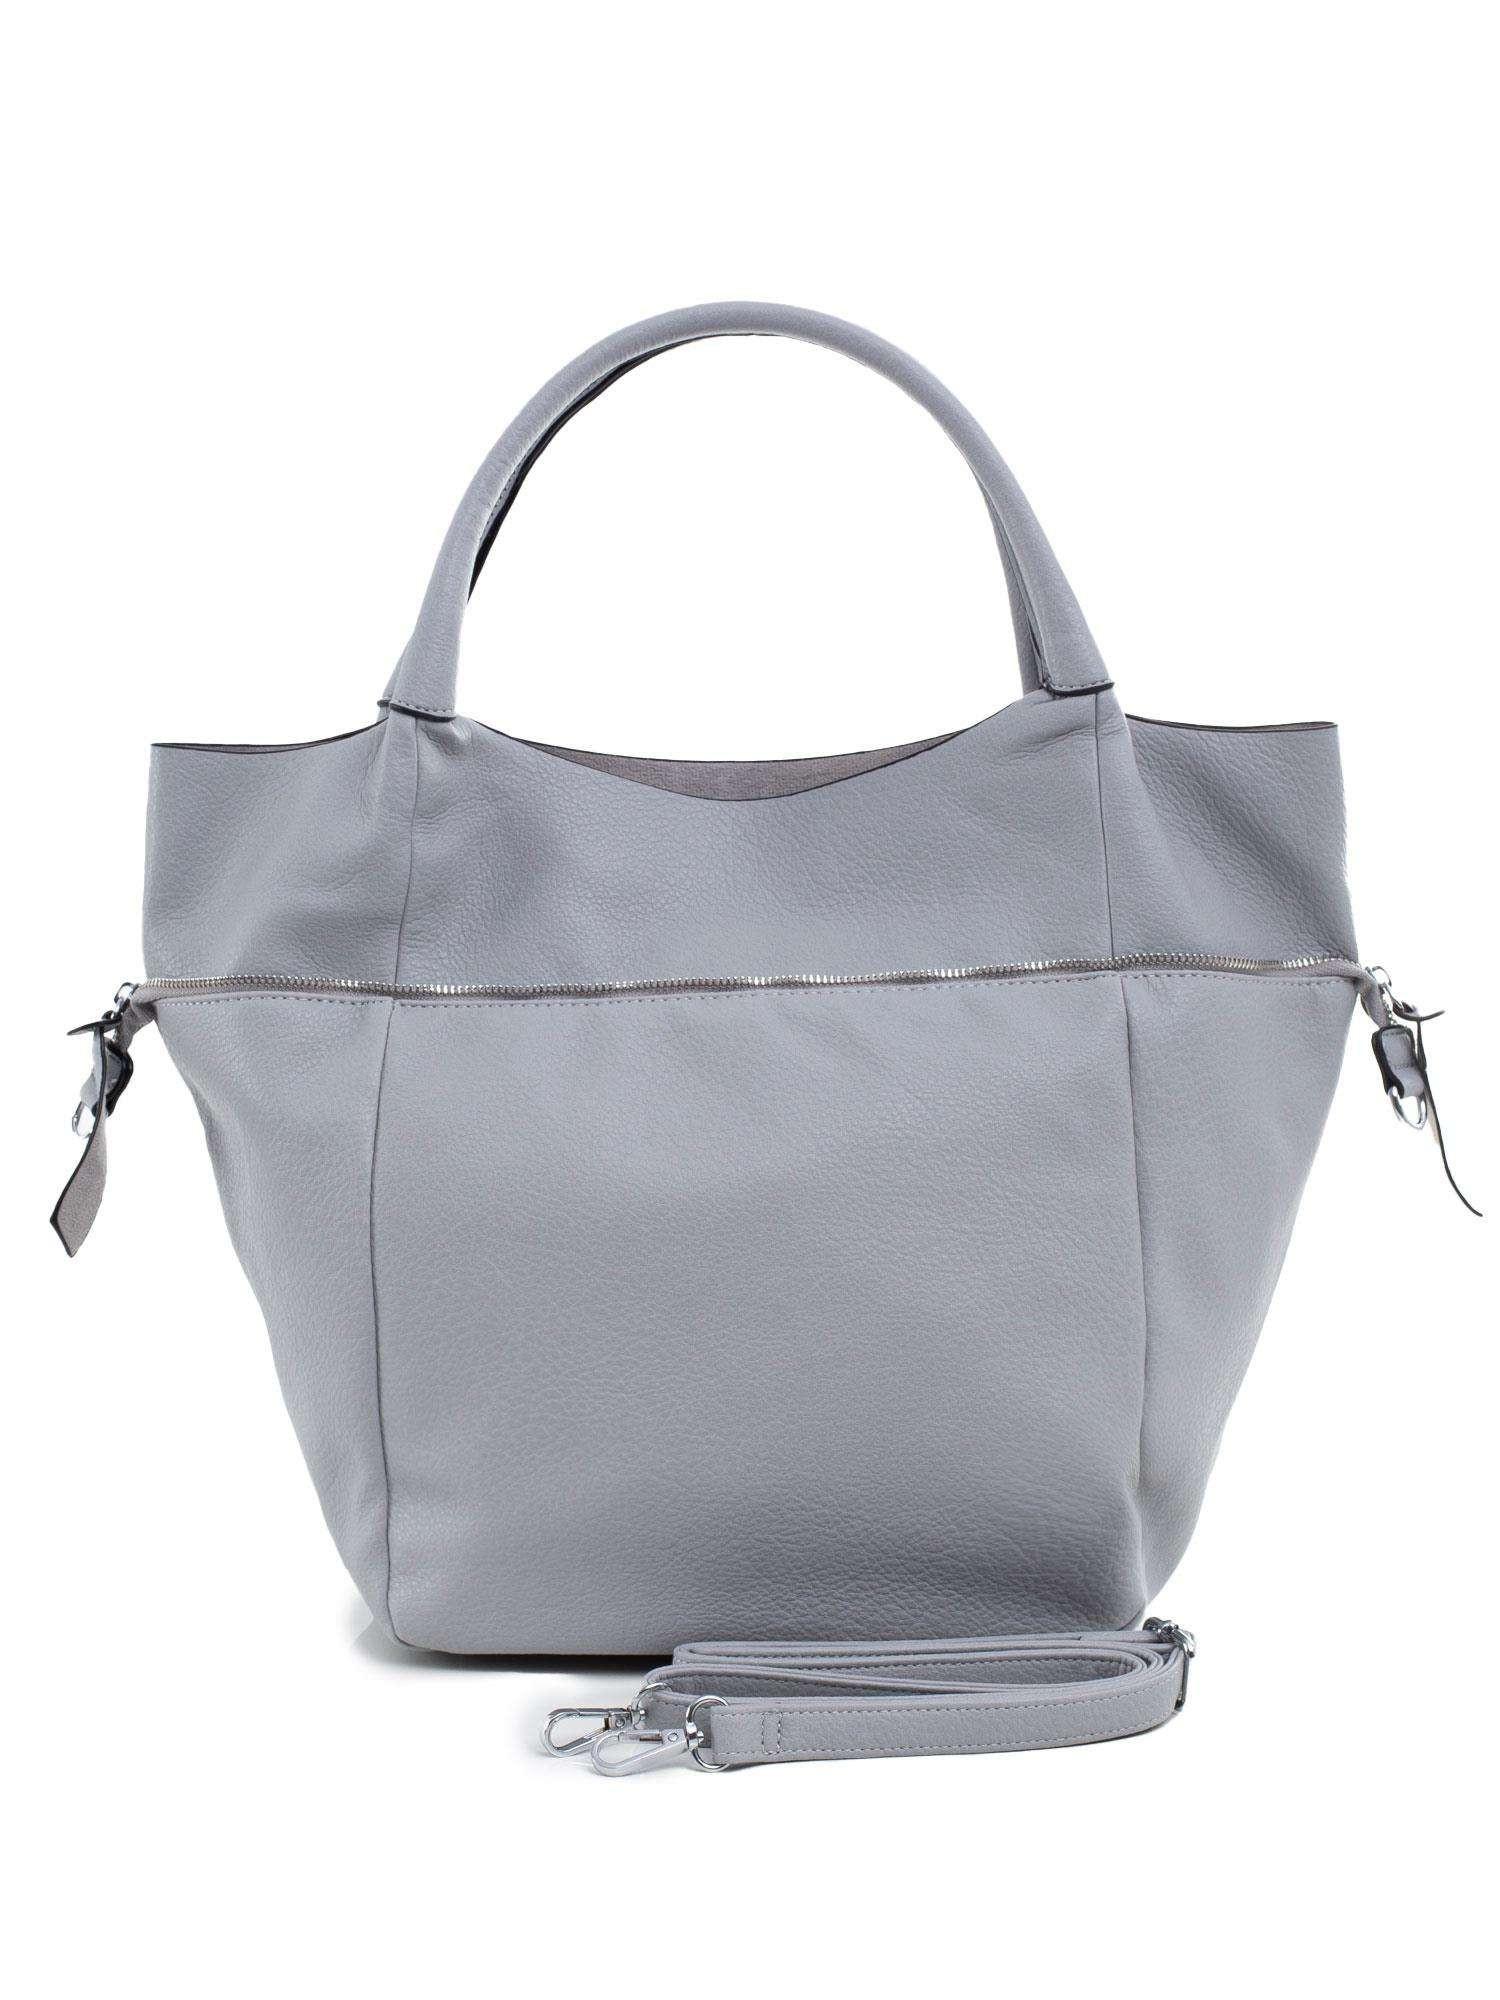 Dámska veľká sivá taška ONE SIZE